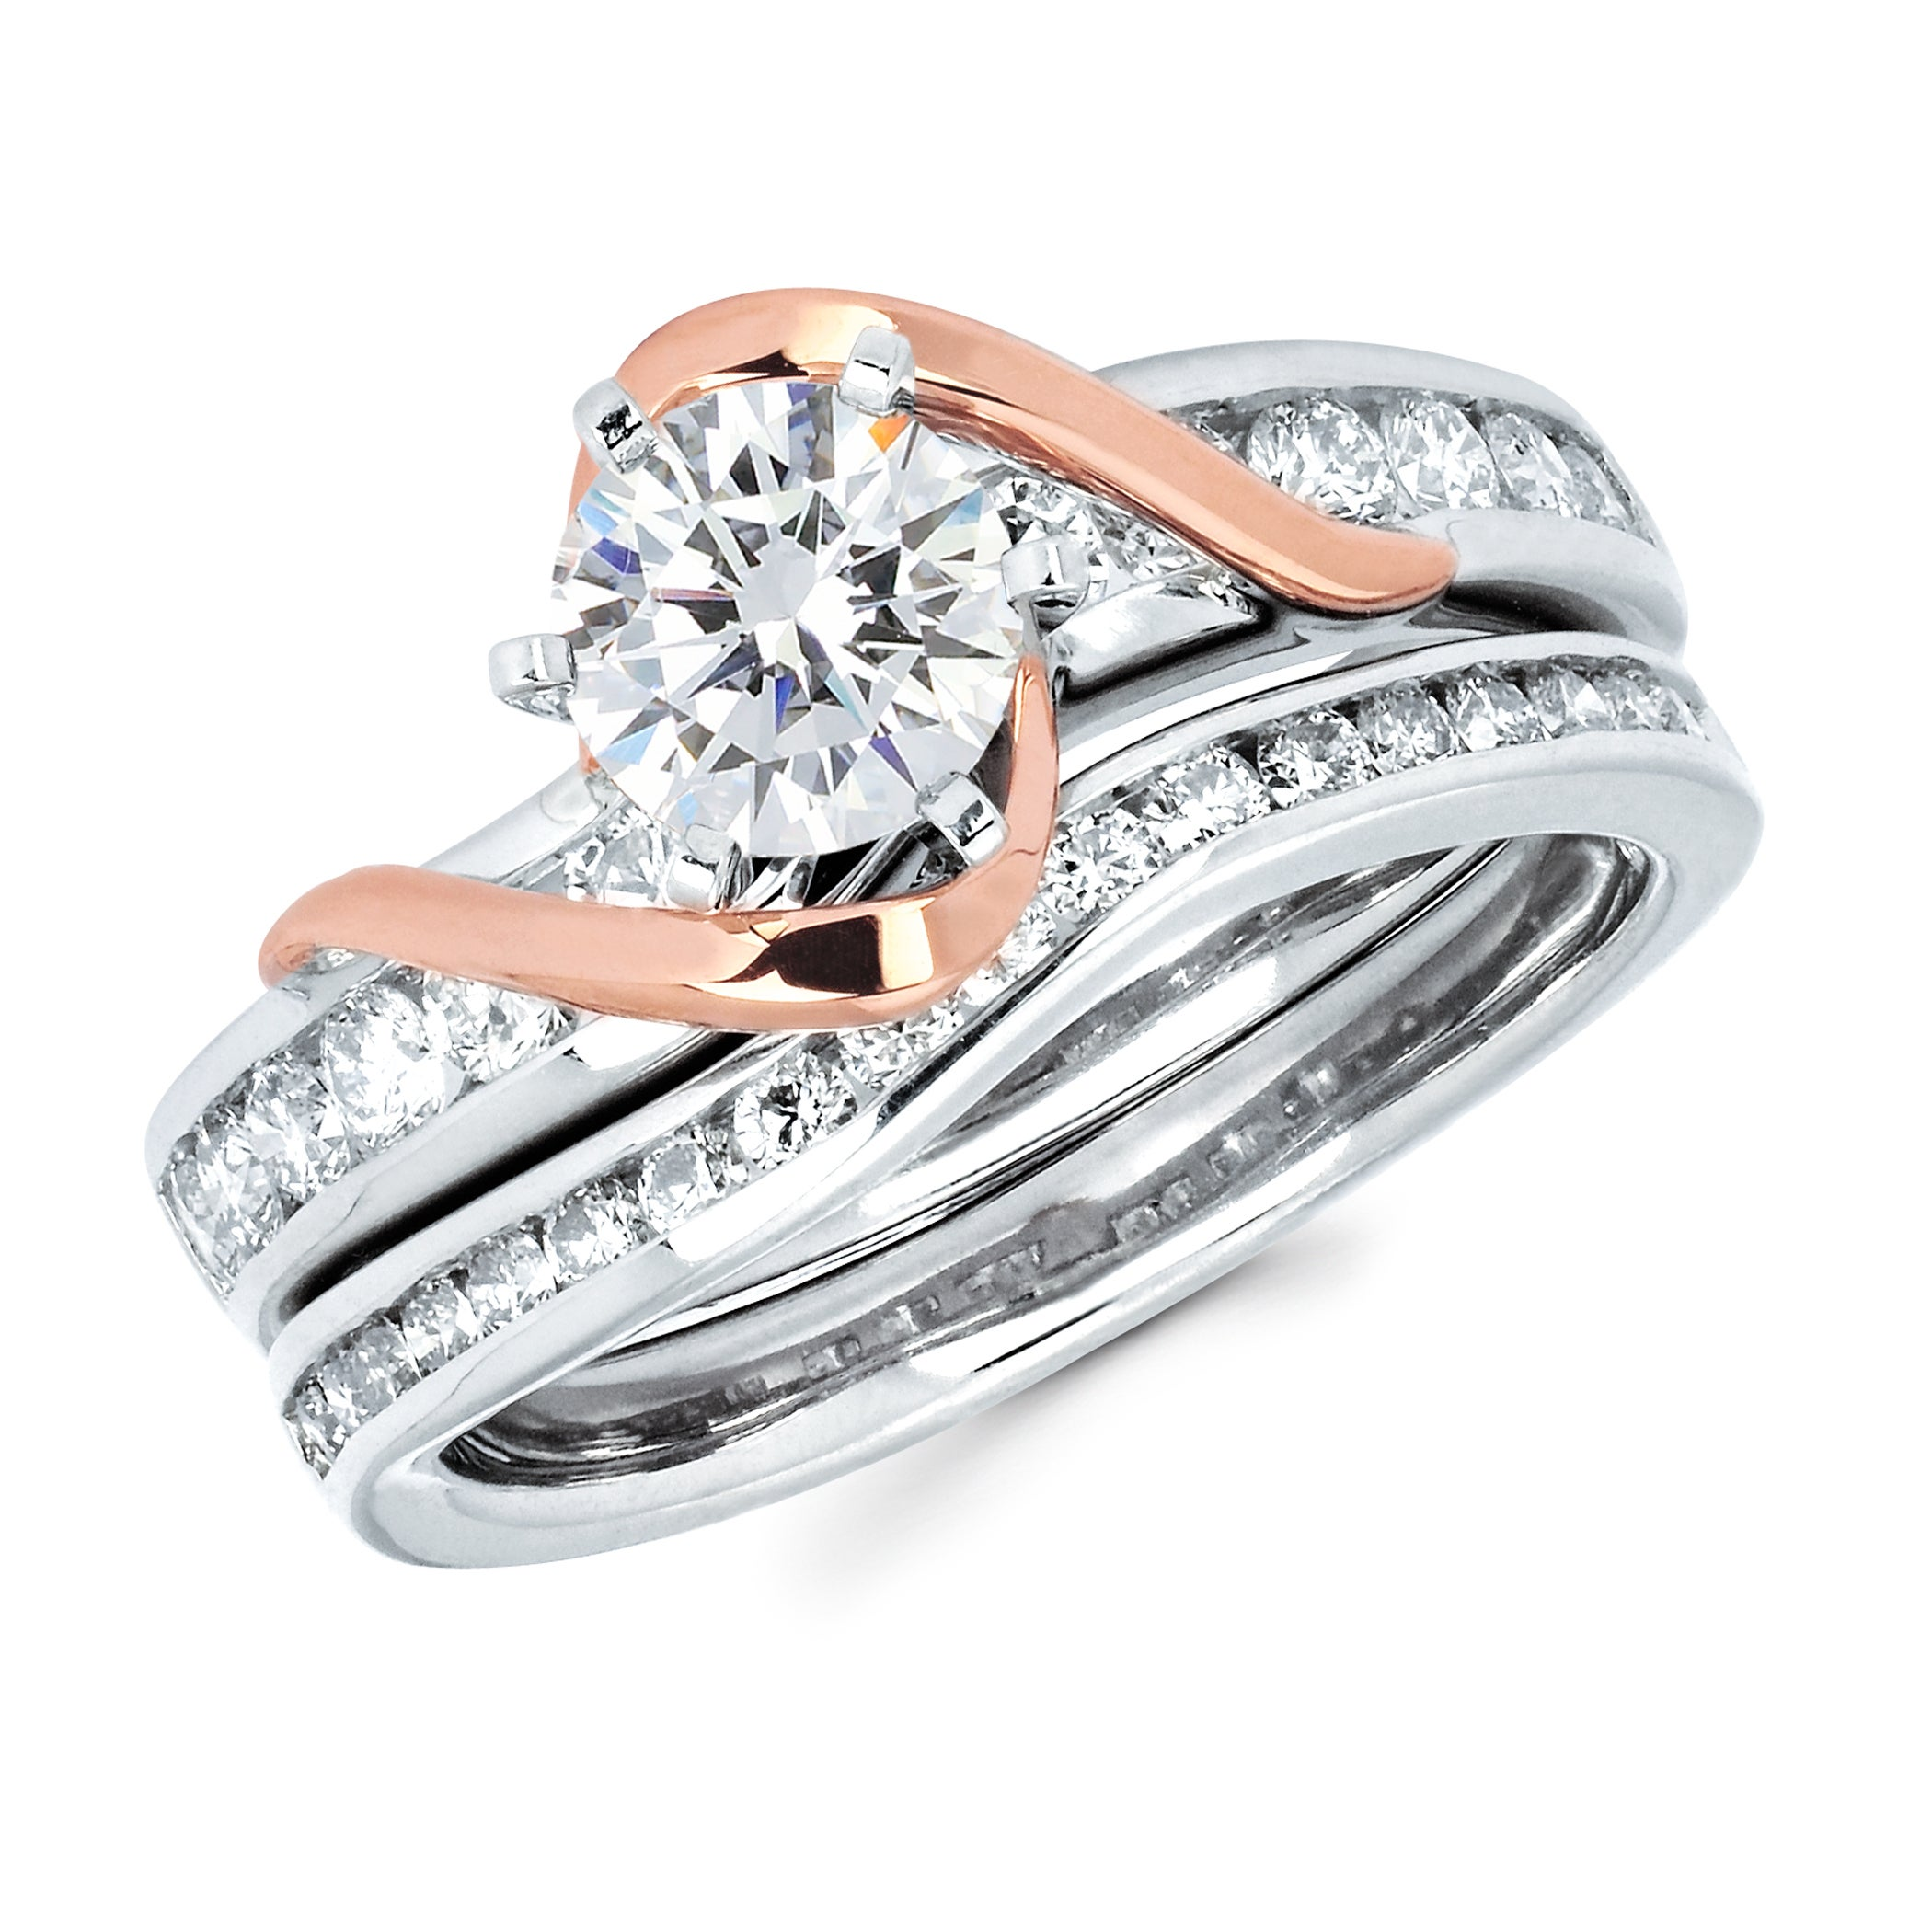 14k Two-tone Gold 1 1/2ct TDW Solitaire Diamond Bridal Set (I-J, I1-I2)